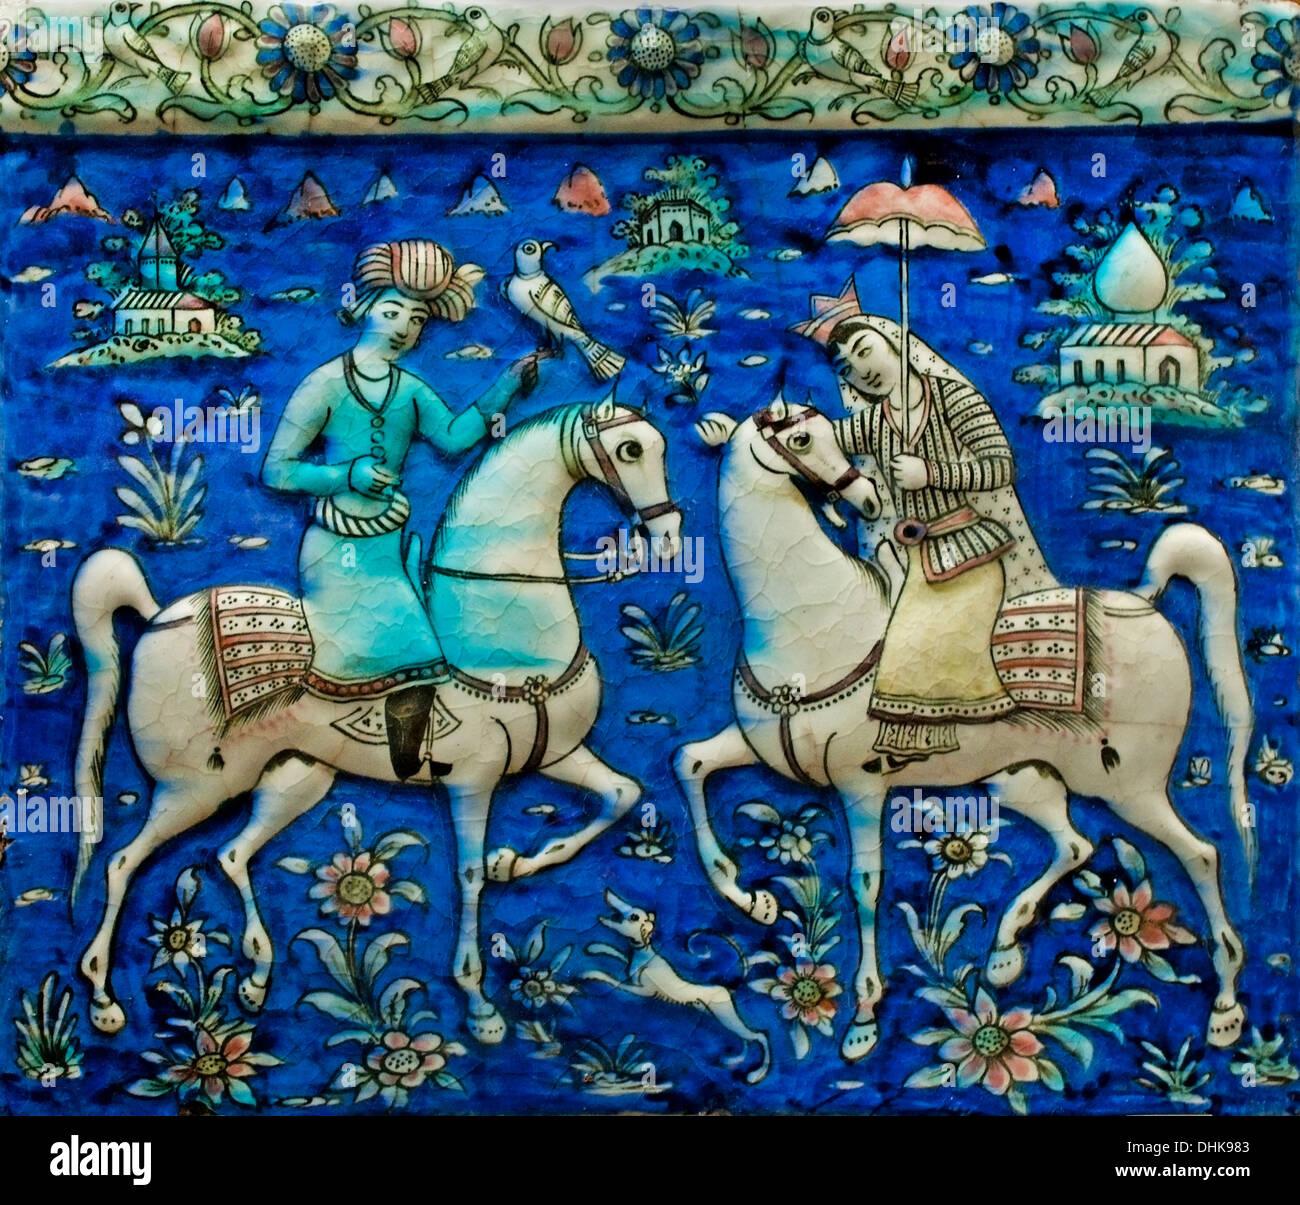 Plate Un Cavalier et une Cavalière - A Rider and Rider 19 Century Teheran  - Tehran Iran Quajar Persia Persian Stock Photo